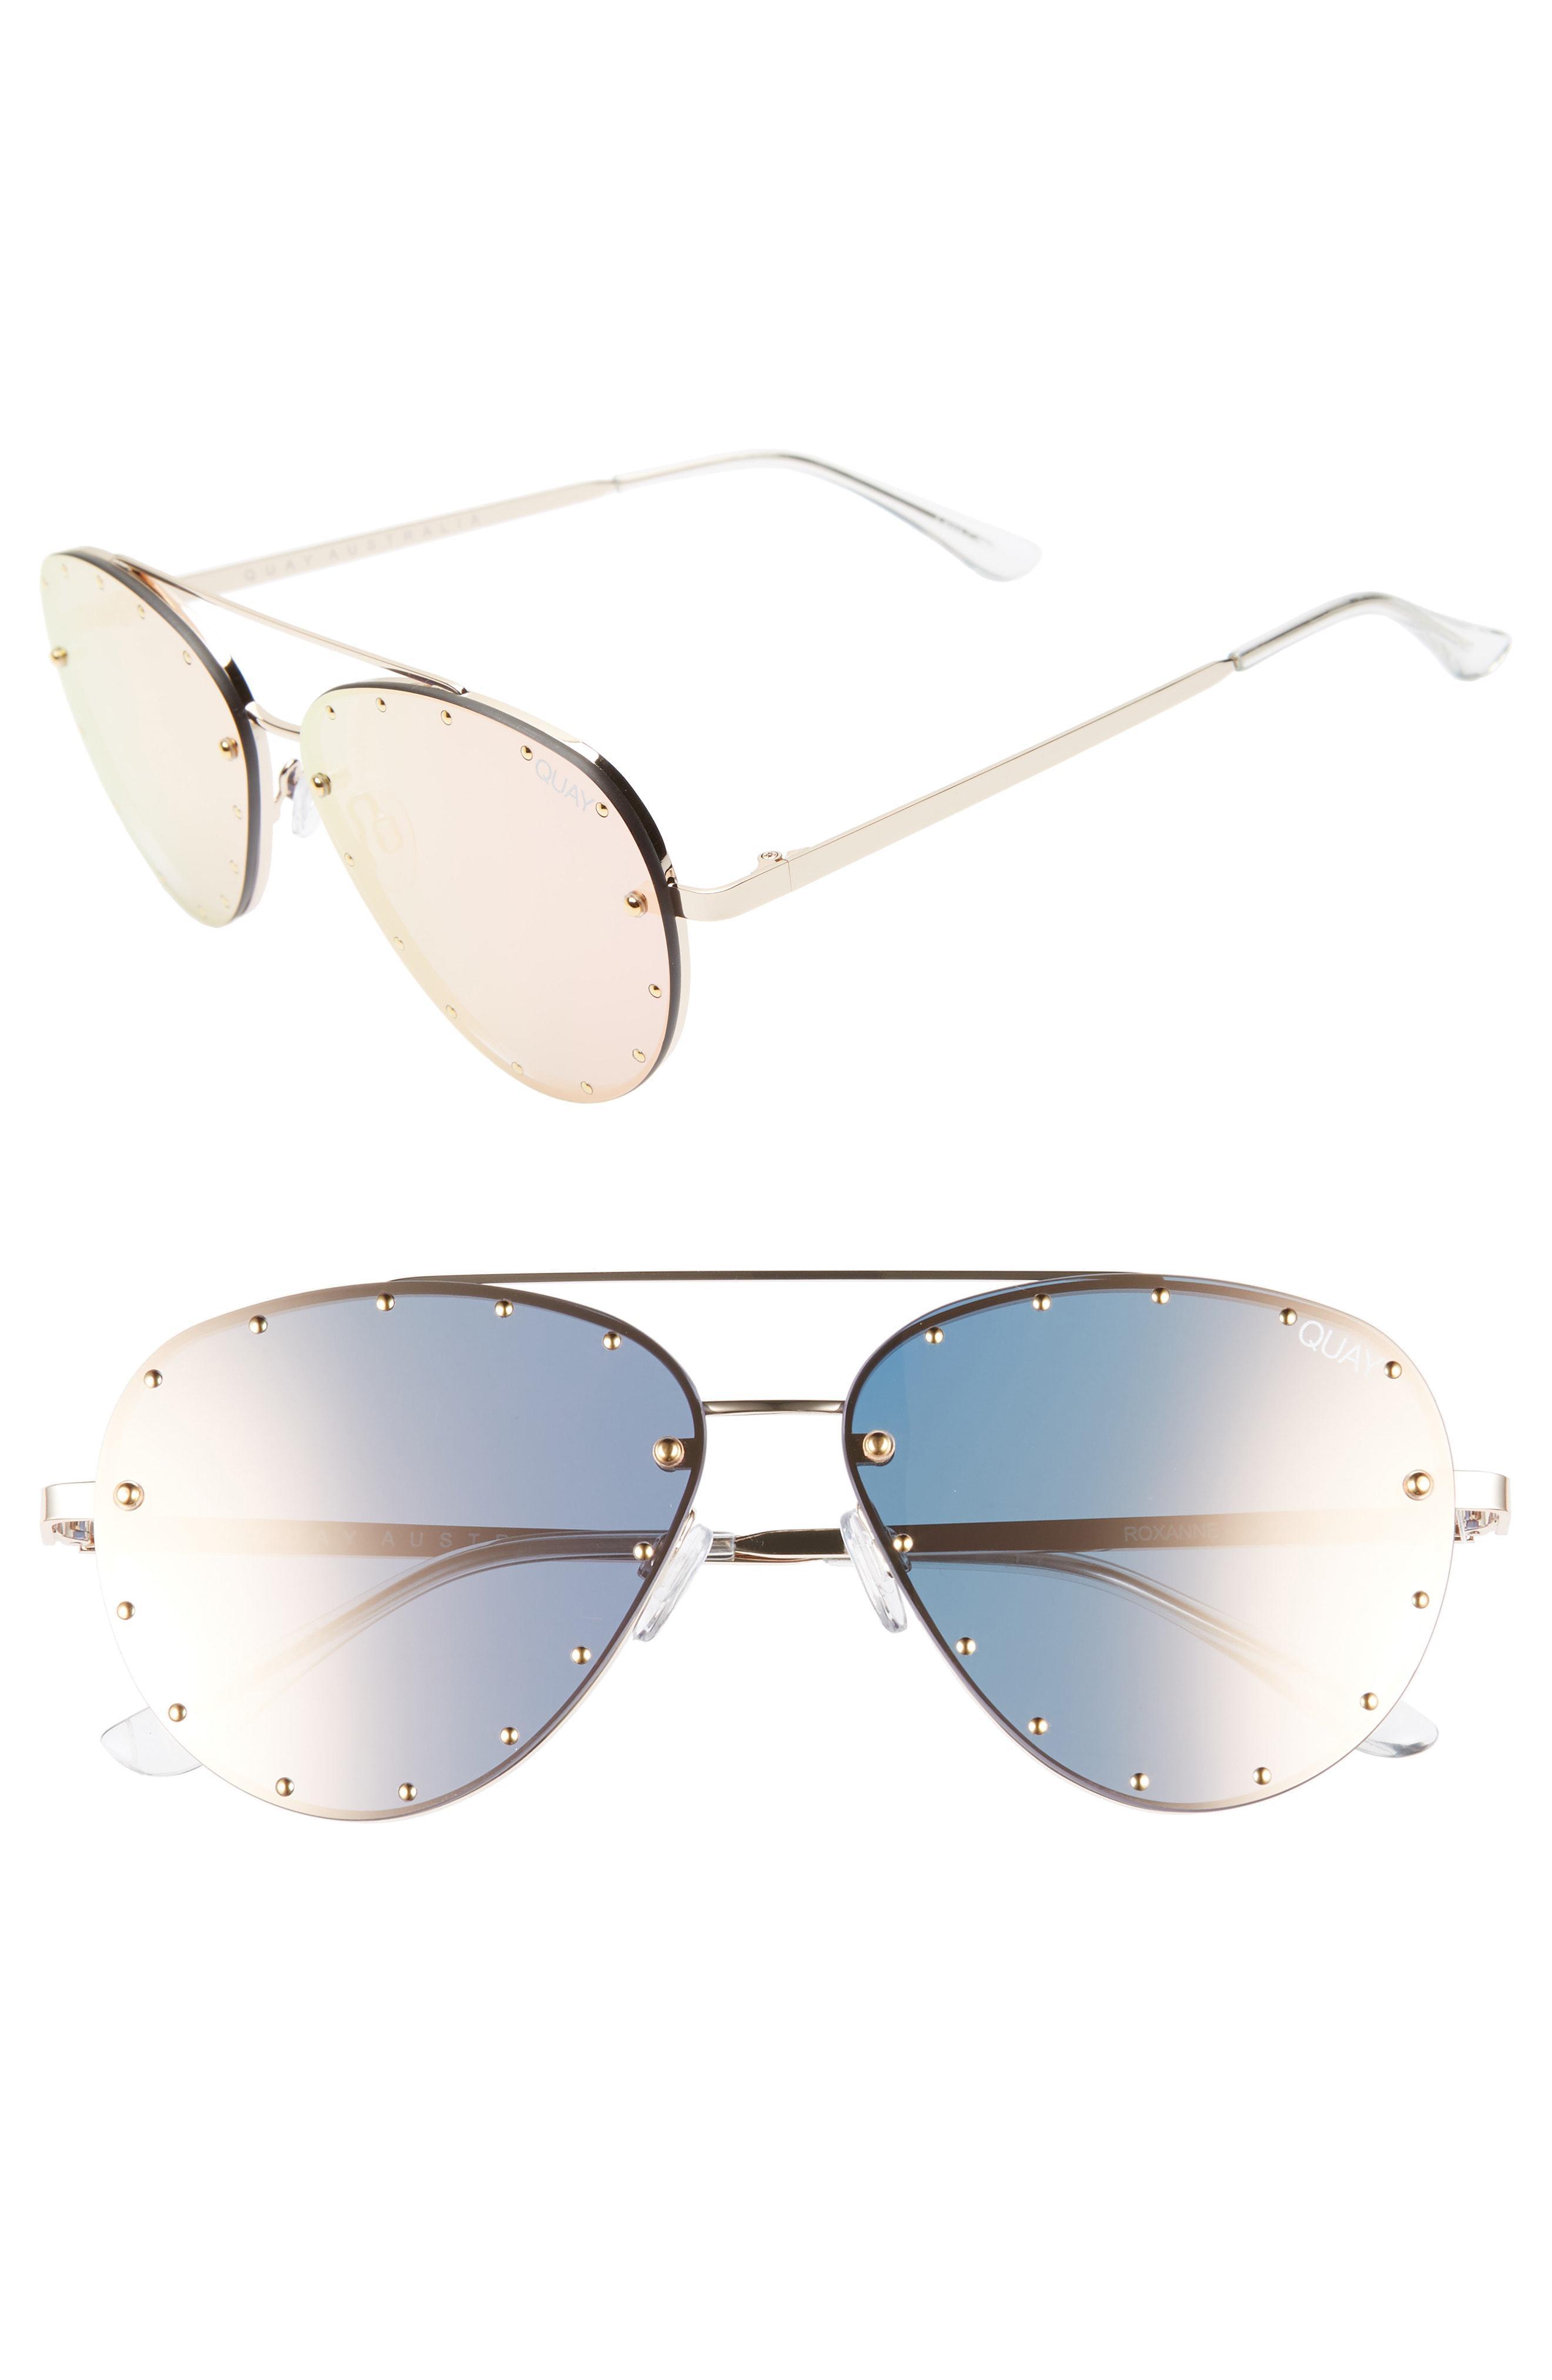 114189b29acac Quay X Jaclyn Hill Roxanne 62mm Stud Aviator Sunglasses - Lyst